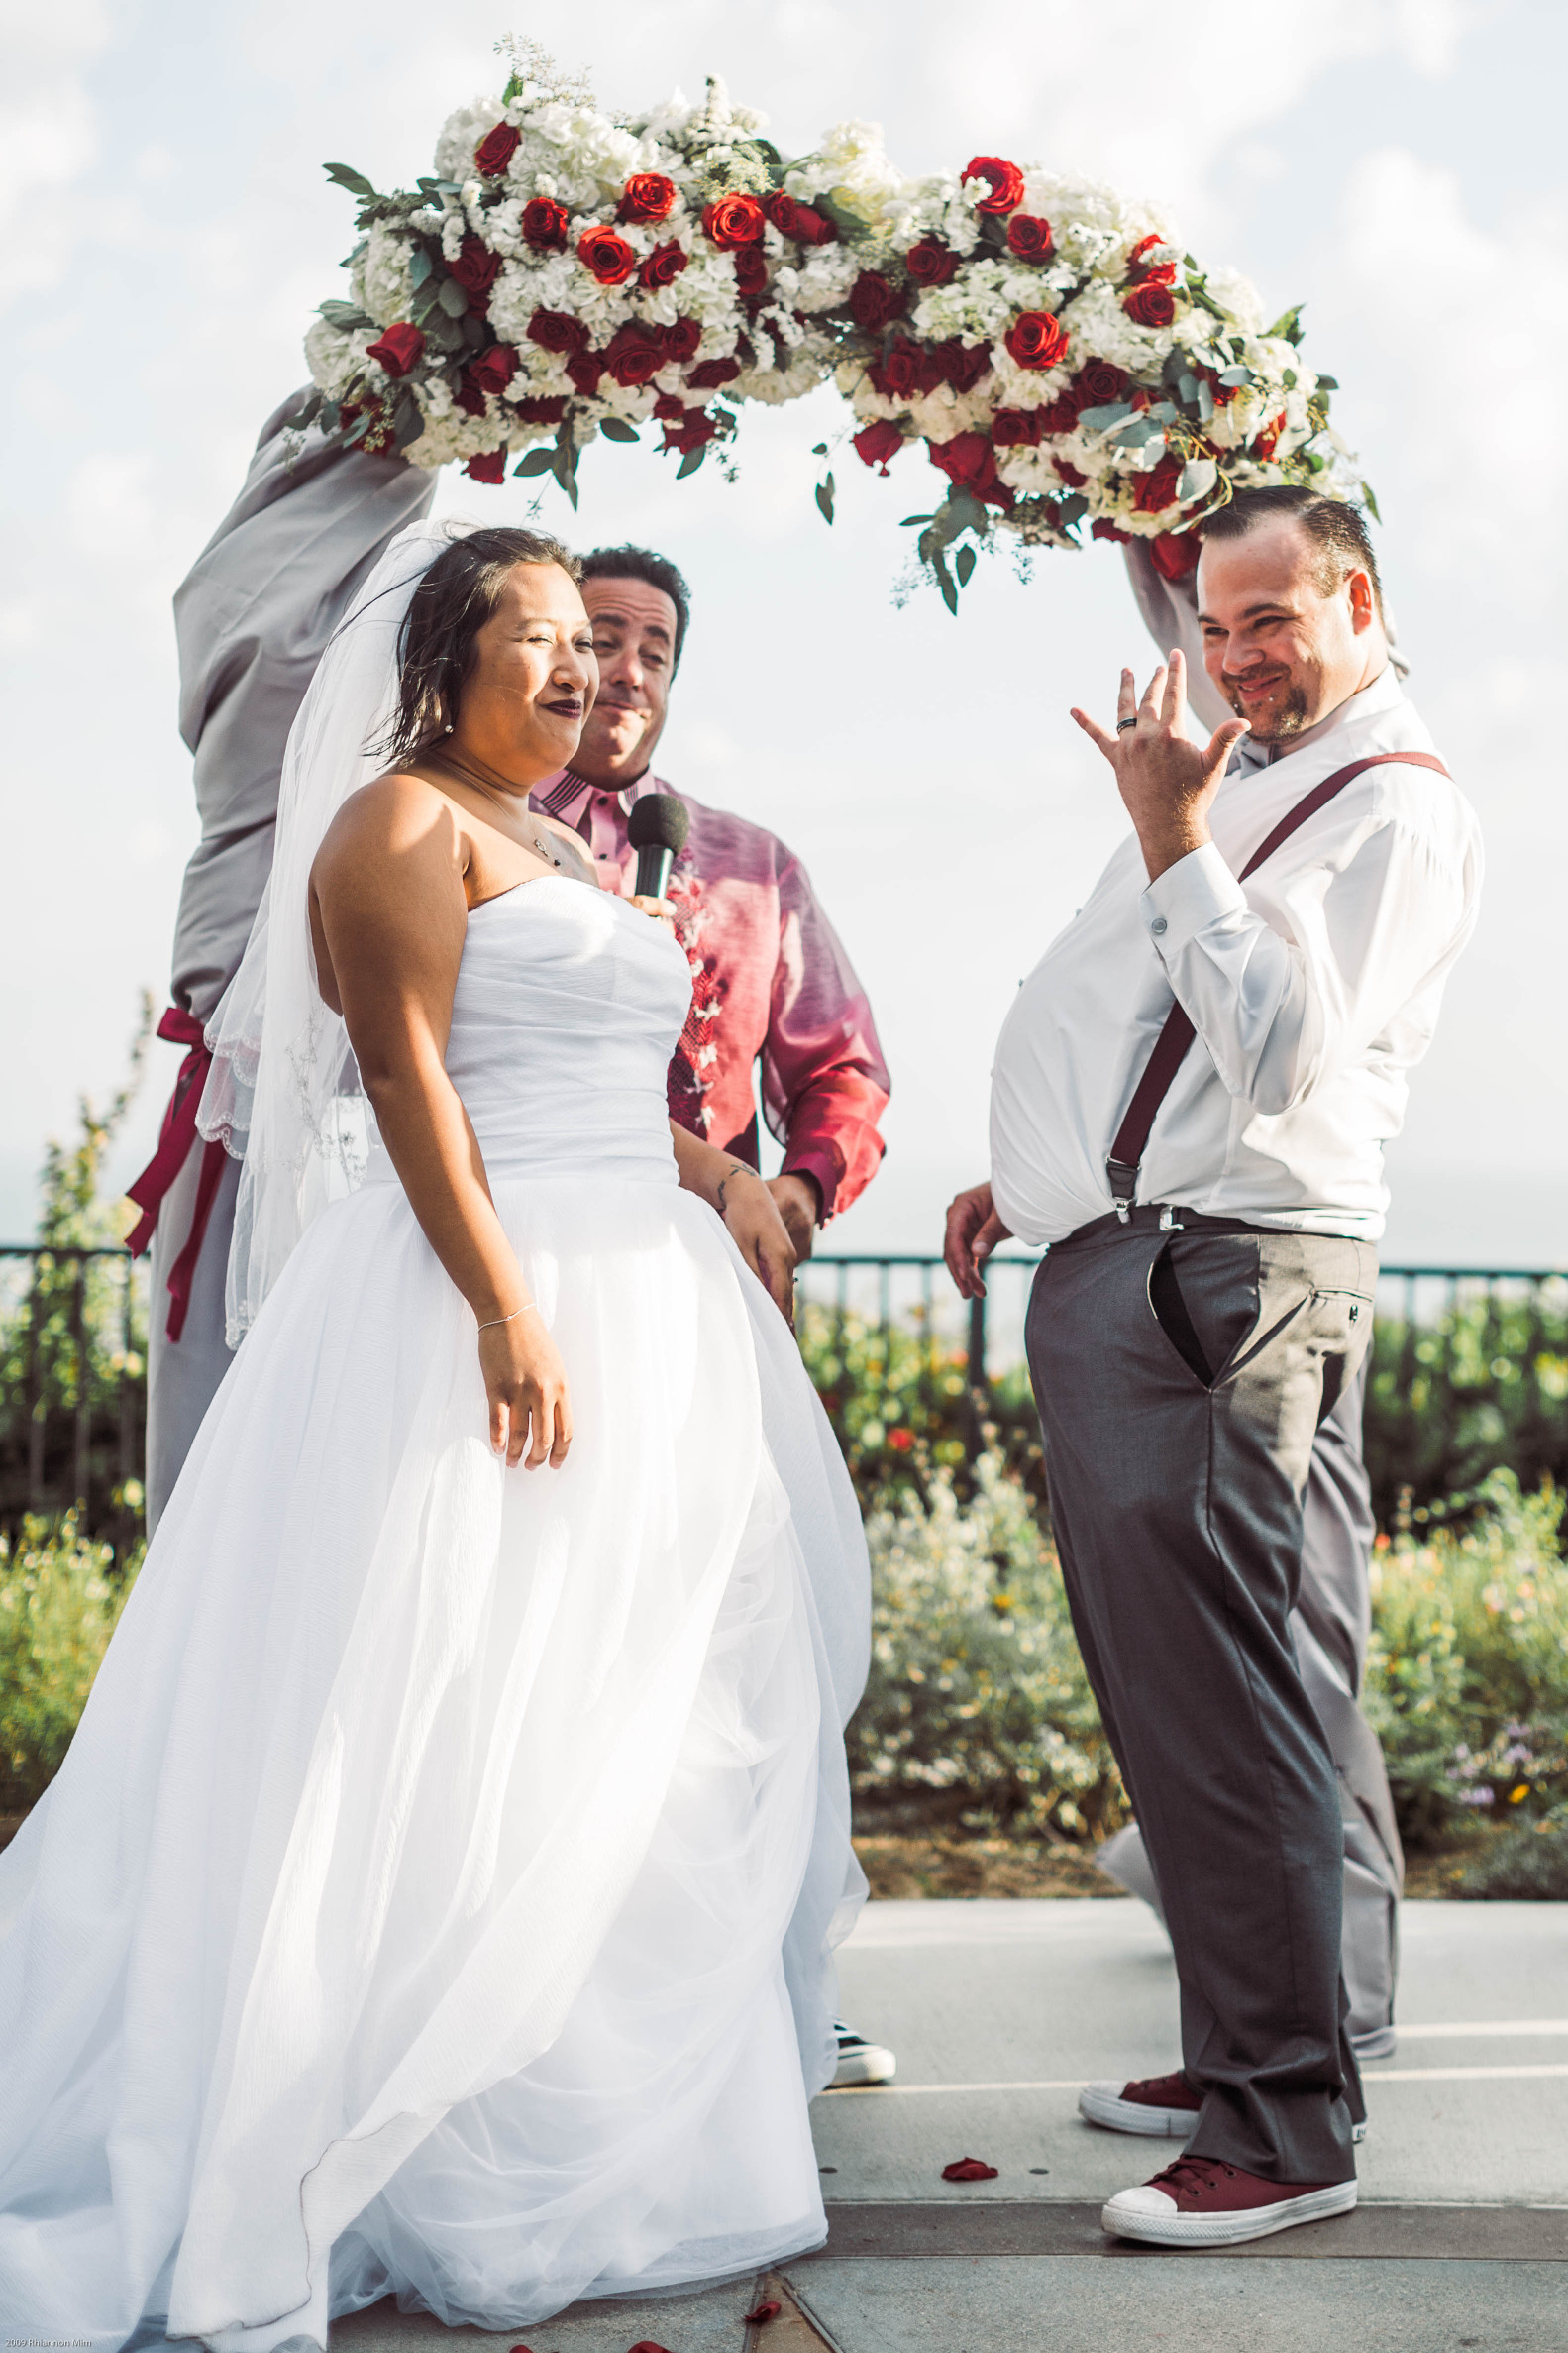 20170909_Wedding_0893